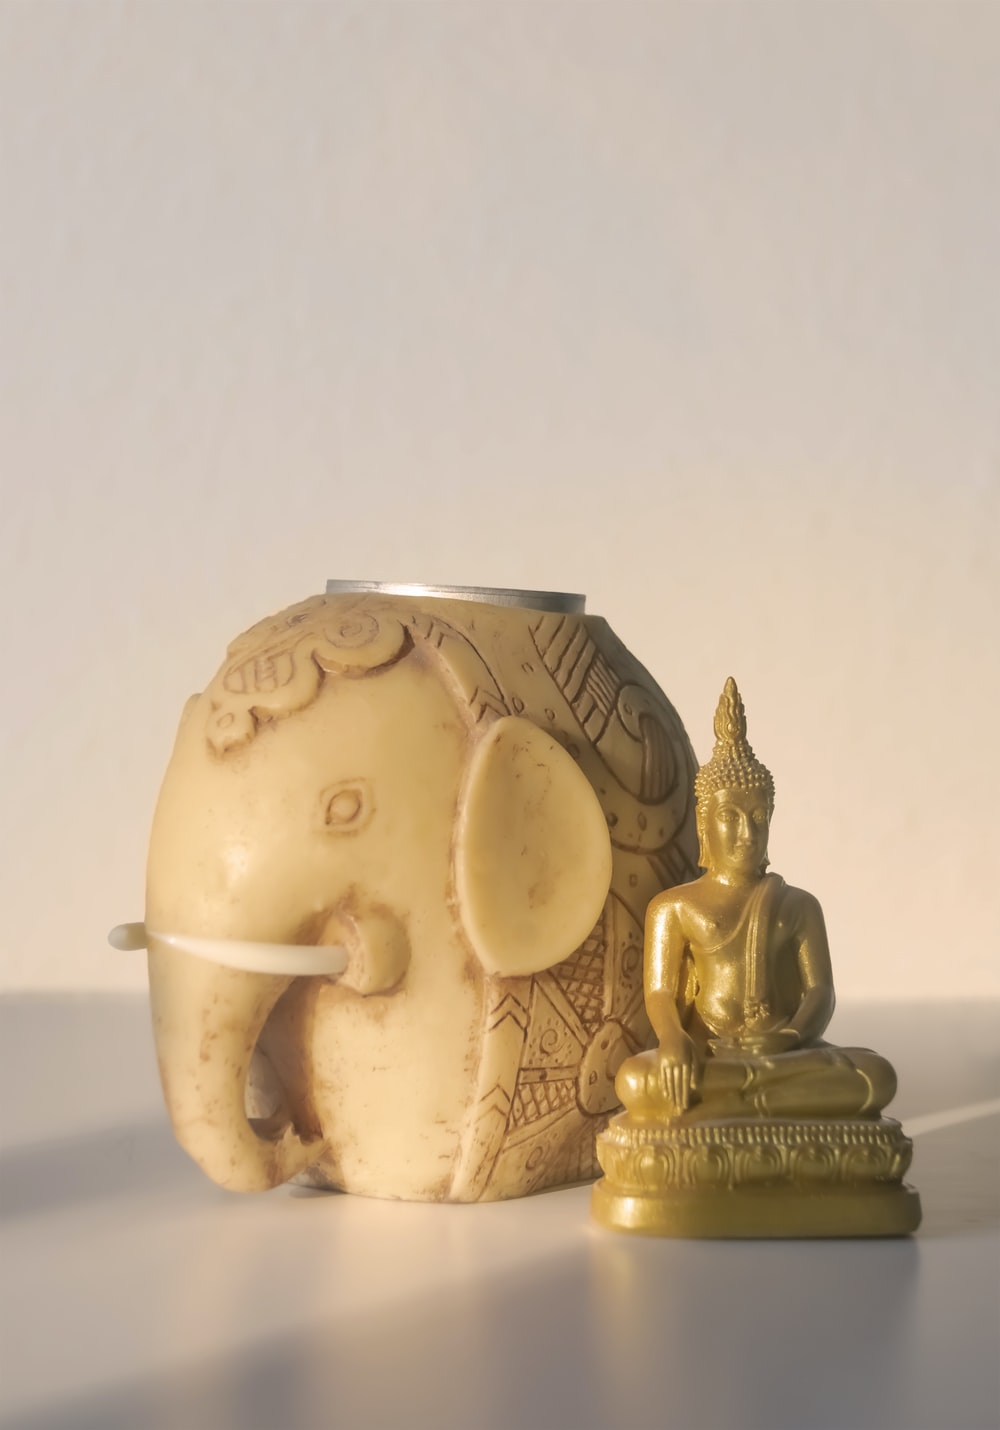 gold and white ceramic figurine